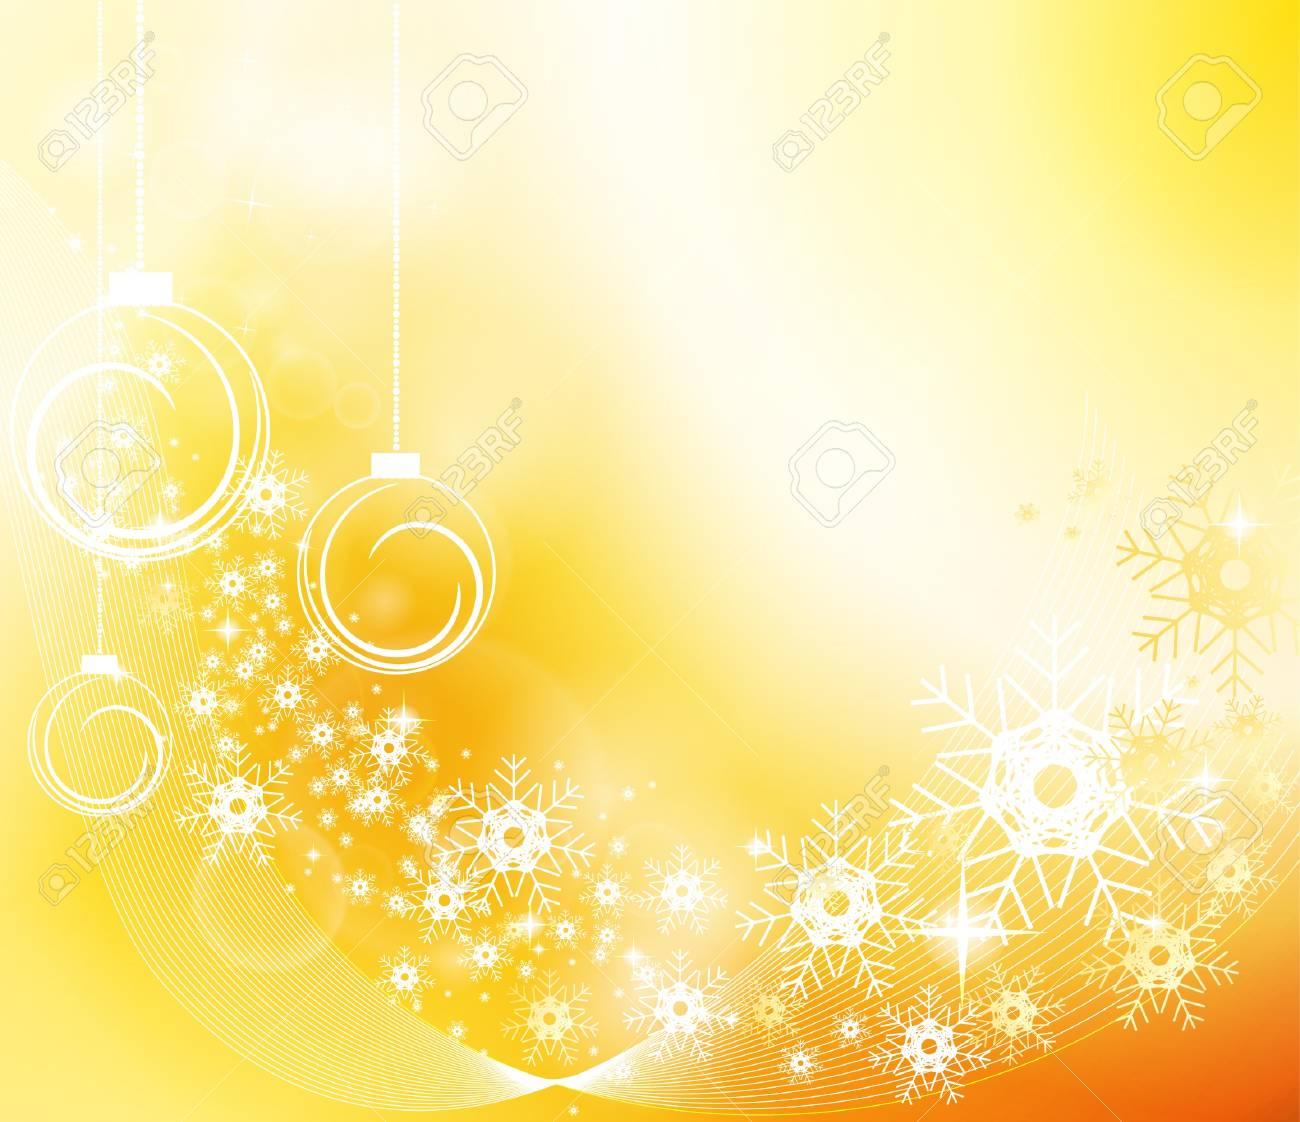 Golden Christmas Background Stock Vector - 11582790